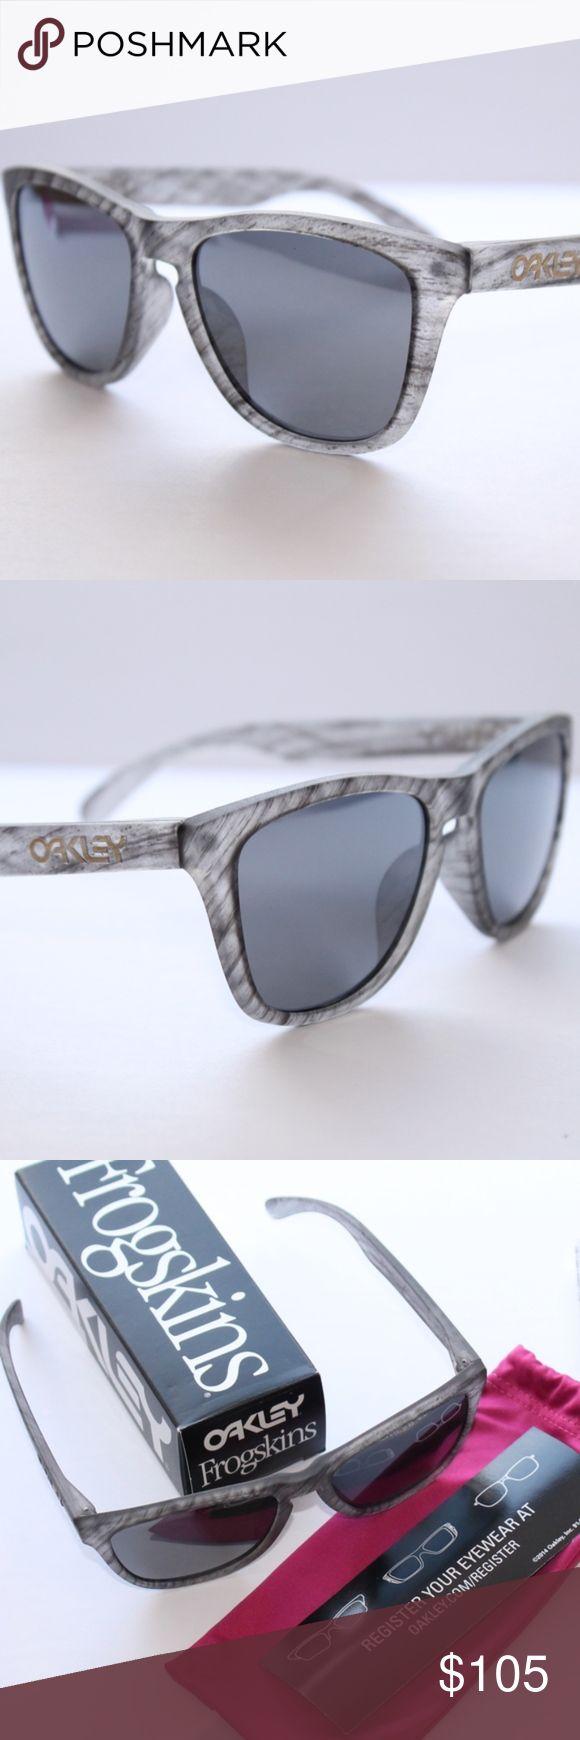 Oakley Frogskins Sunglasses Woodgrain Black Iridiu Brand New 100% Authentic Oakley Frogskins Sunglasses Woodgrain Black Iridium oo9013-B655 55/17 133 Oakley Accessories Sunglasses